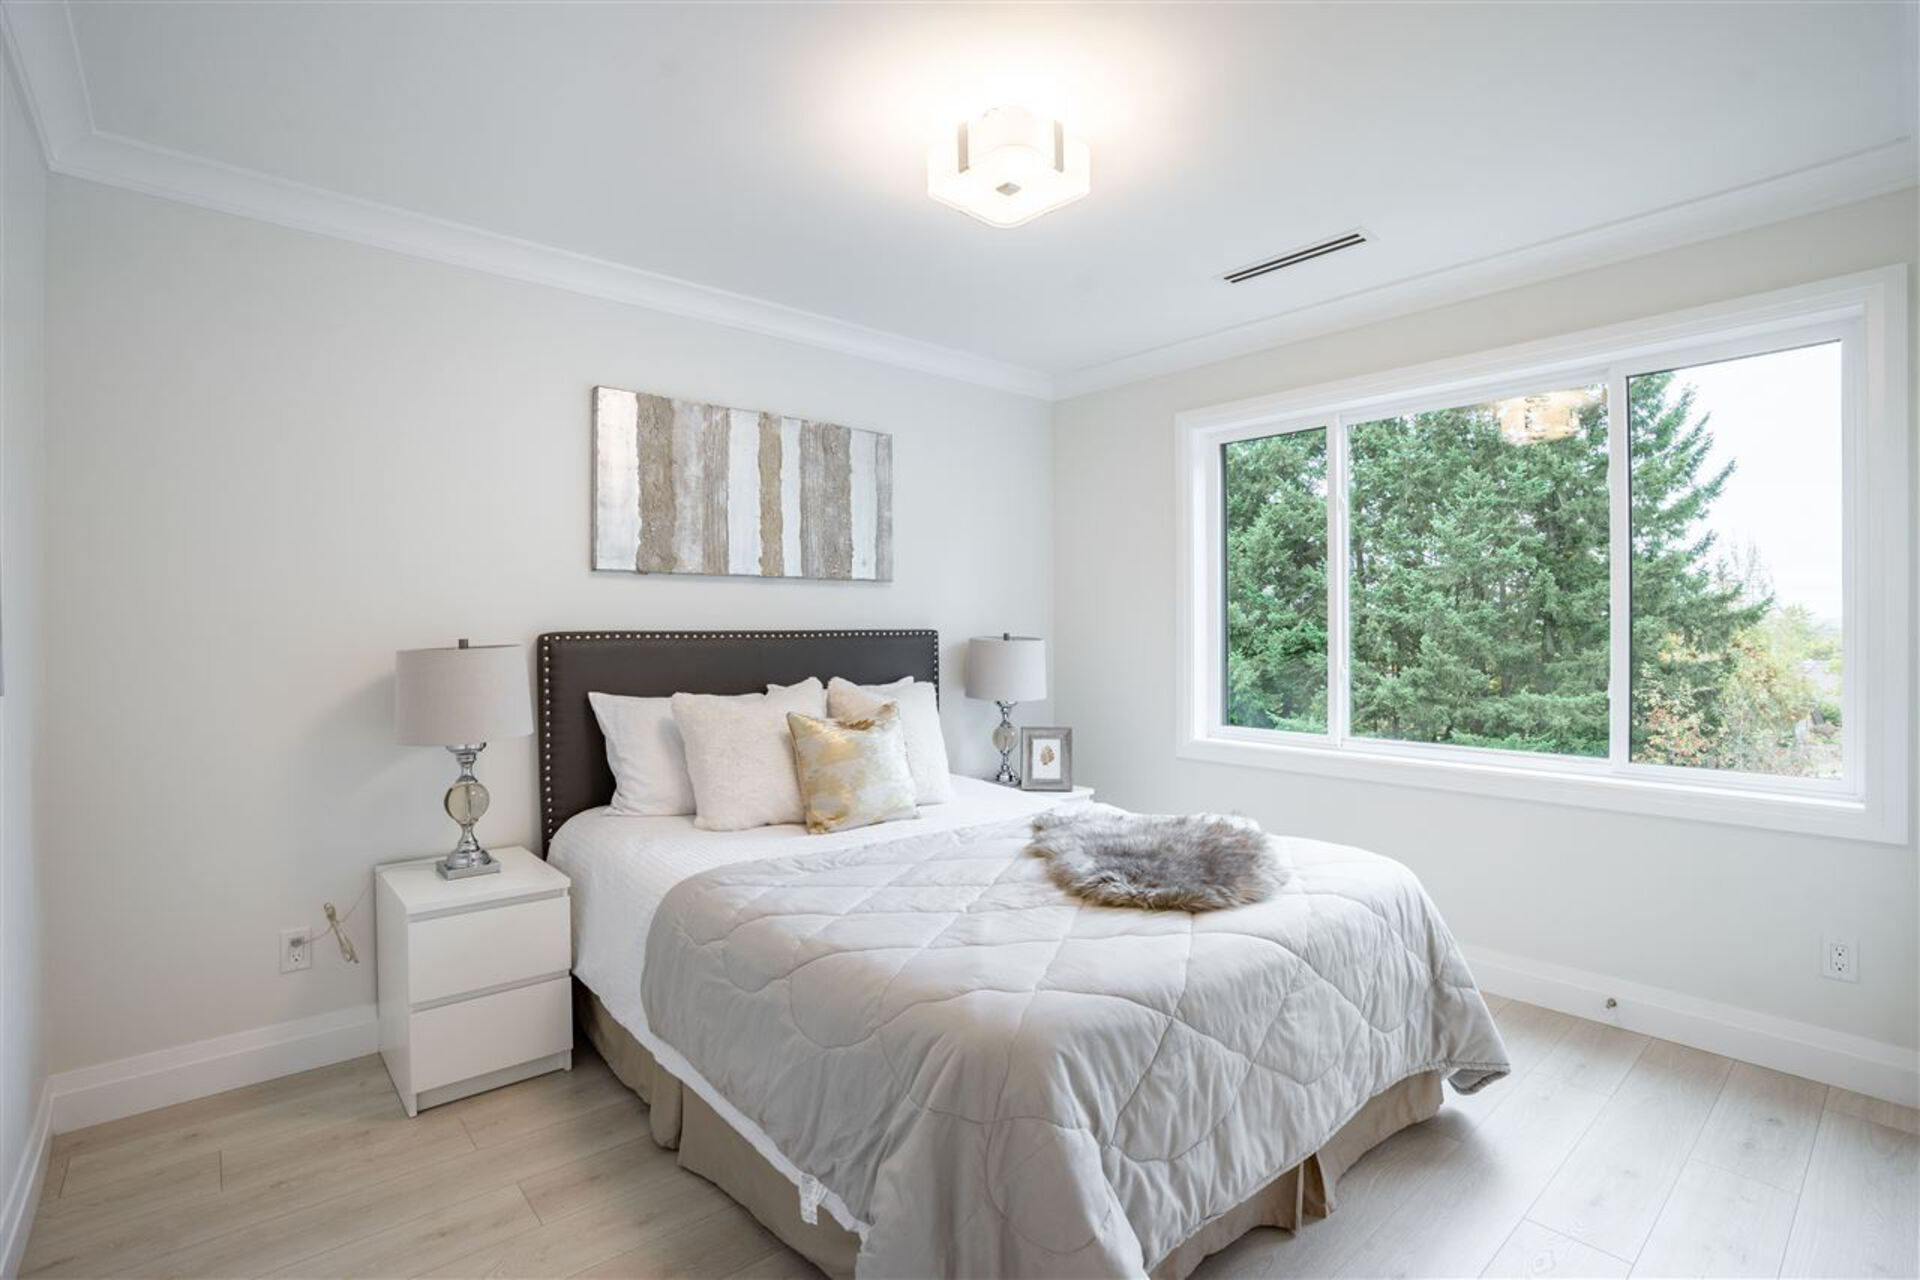 5607-royal-oak-avenue-forest-glen-bs-burnaby-south-22 at 5607 Royal Oak Avenue, Forest Glen BS, Burnaby South